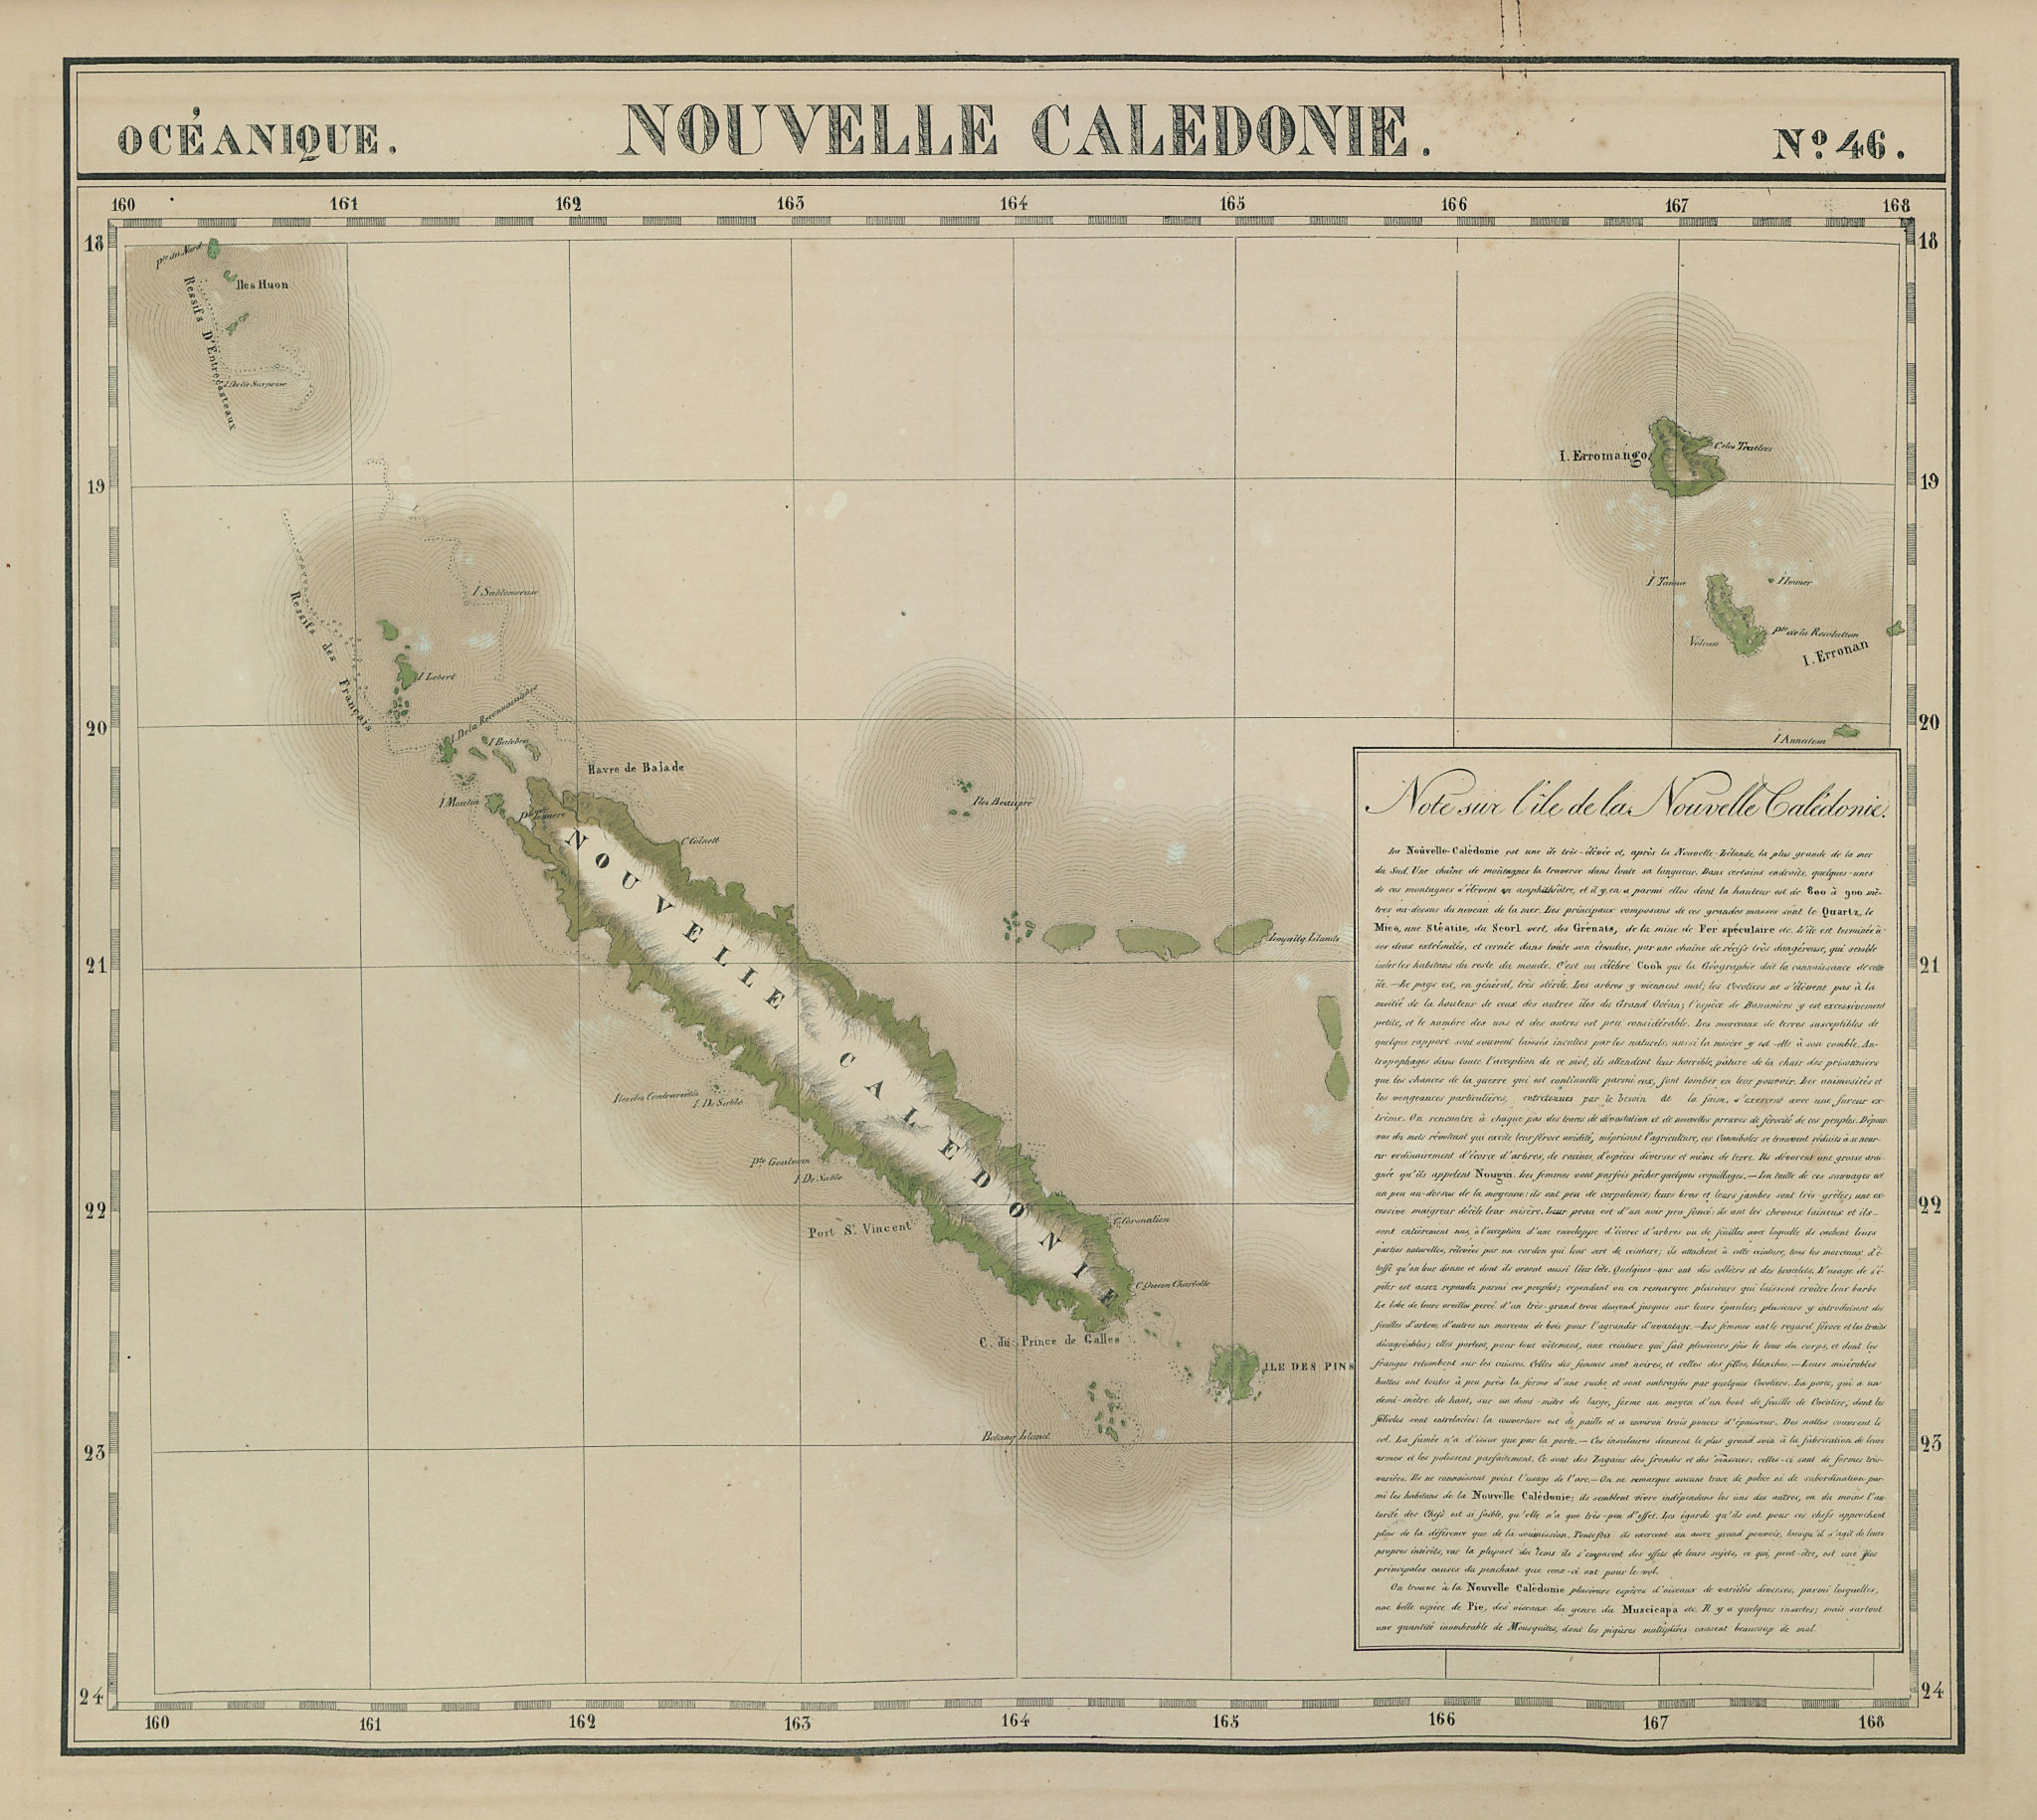 Océanique. Nouvelle Caledonie #46. New Caledonia Vanuatu. VANDERMAELEN 1827 map